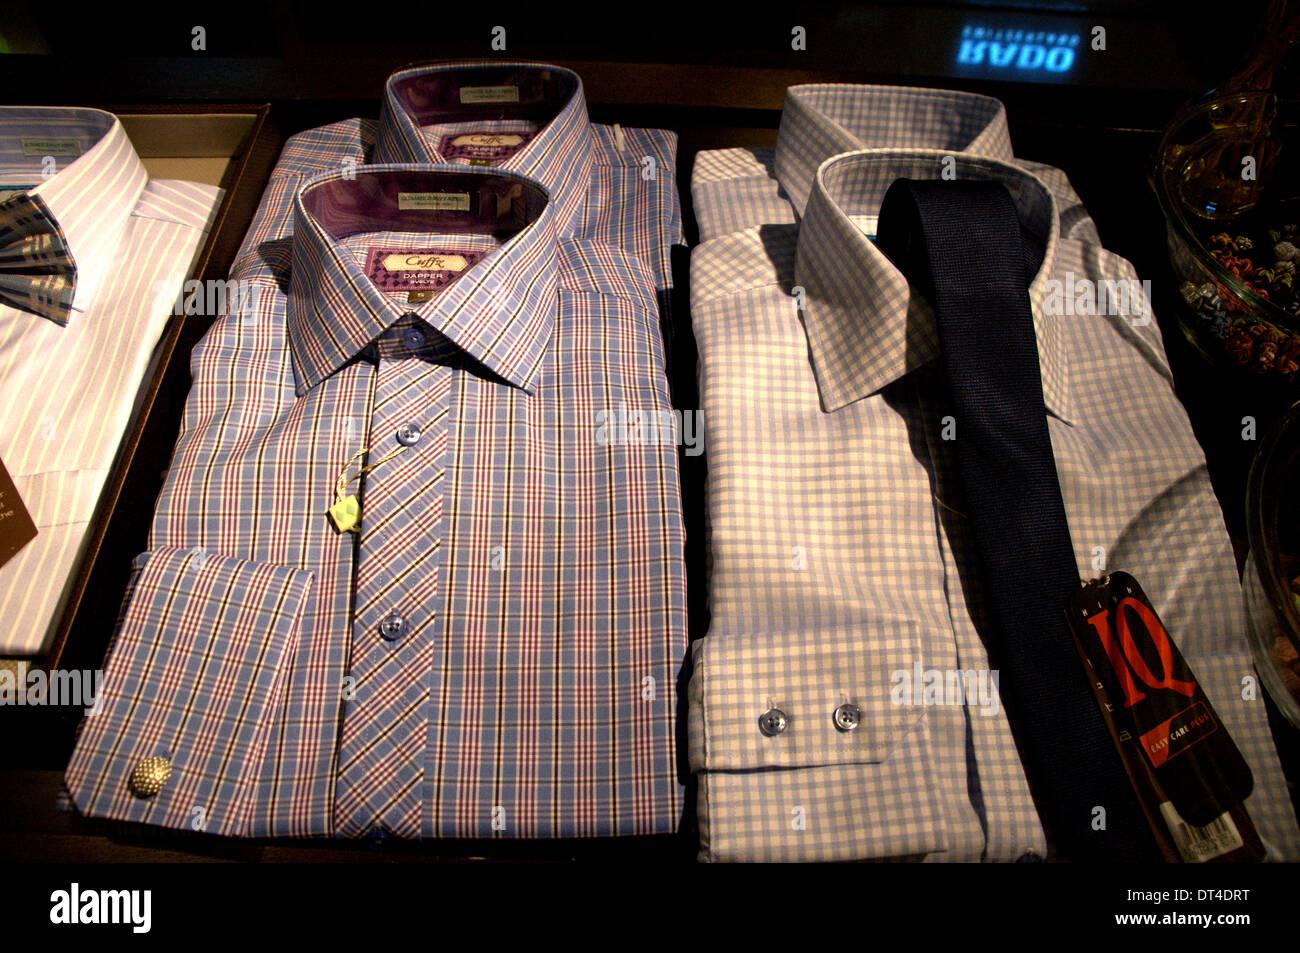 Men's shirt on display in men's boutique in KLCC, Kuala Lumpur - Stock Image